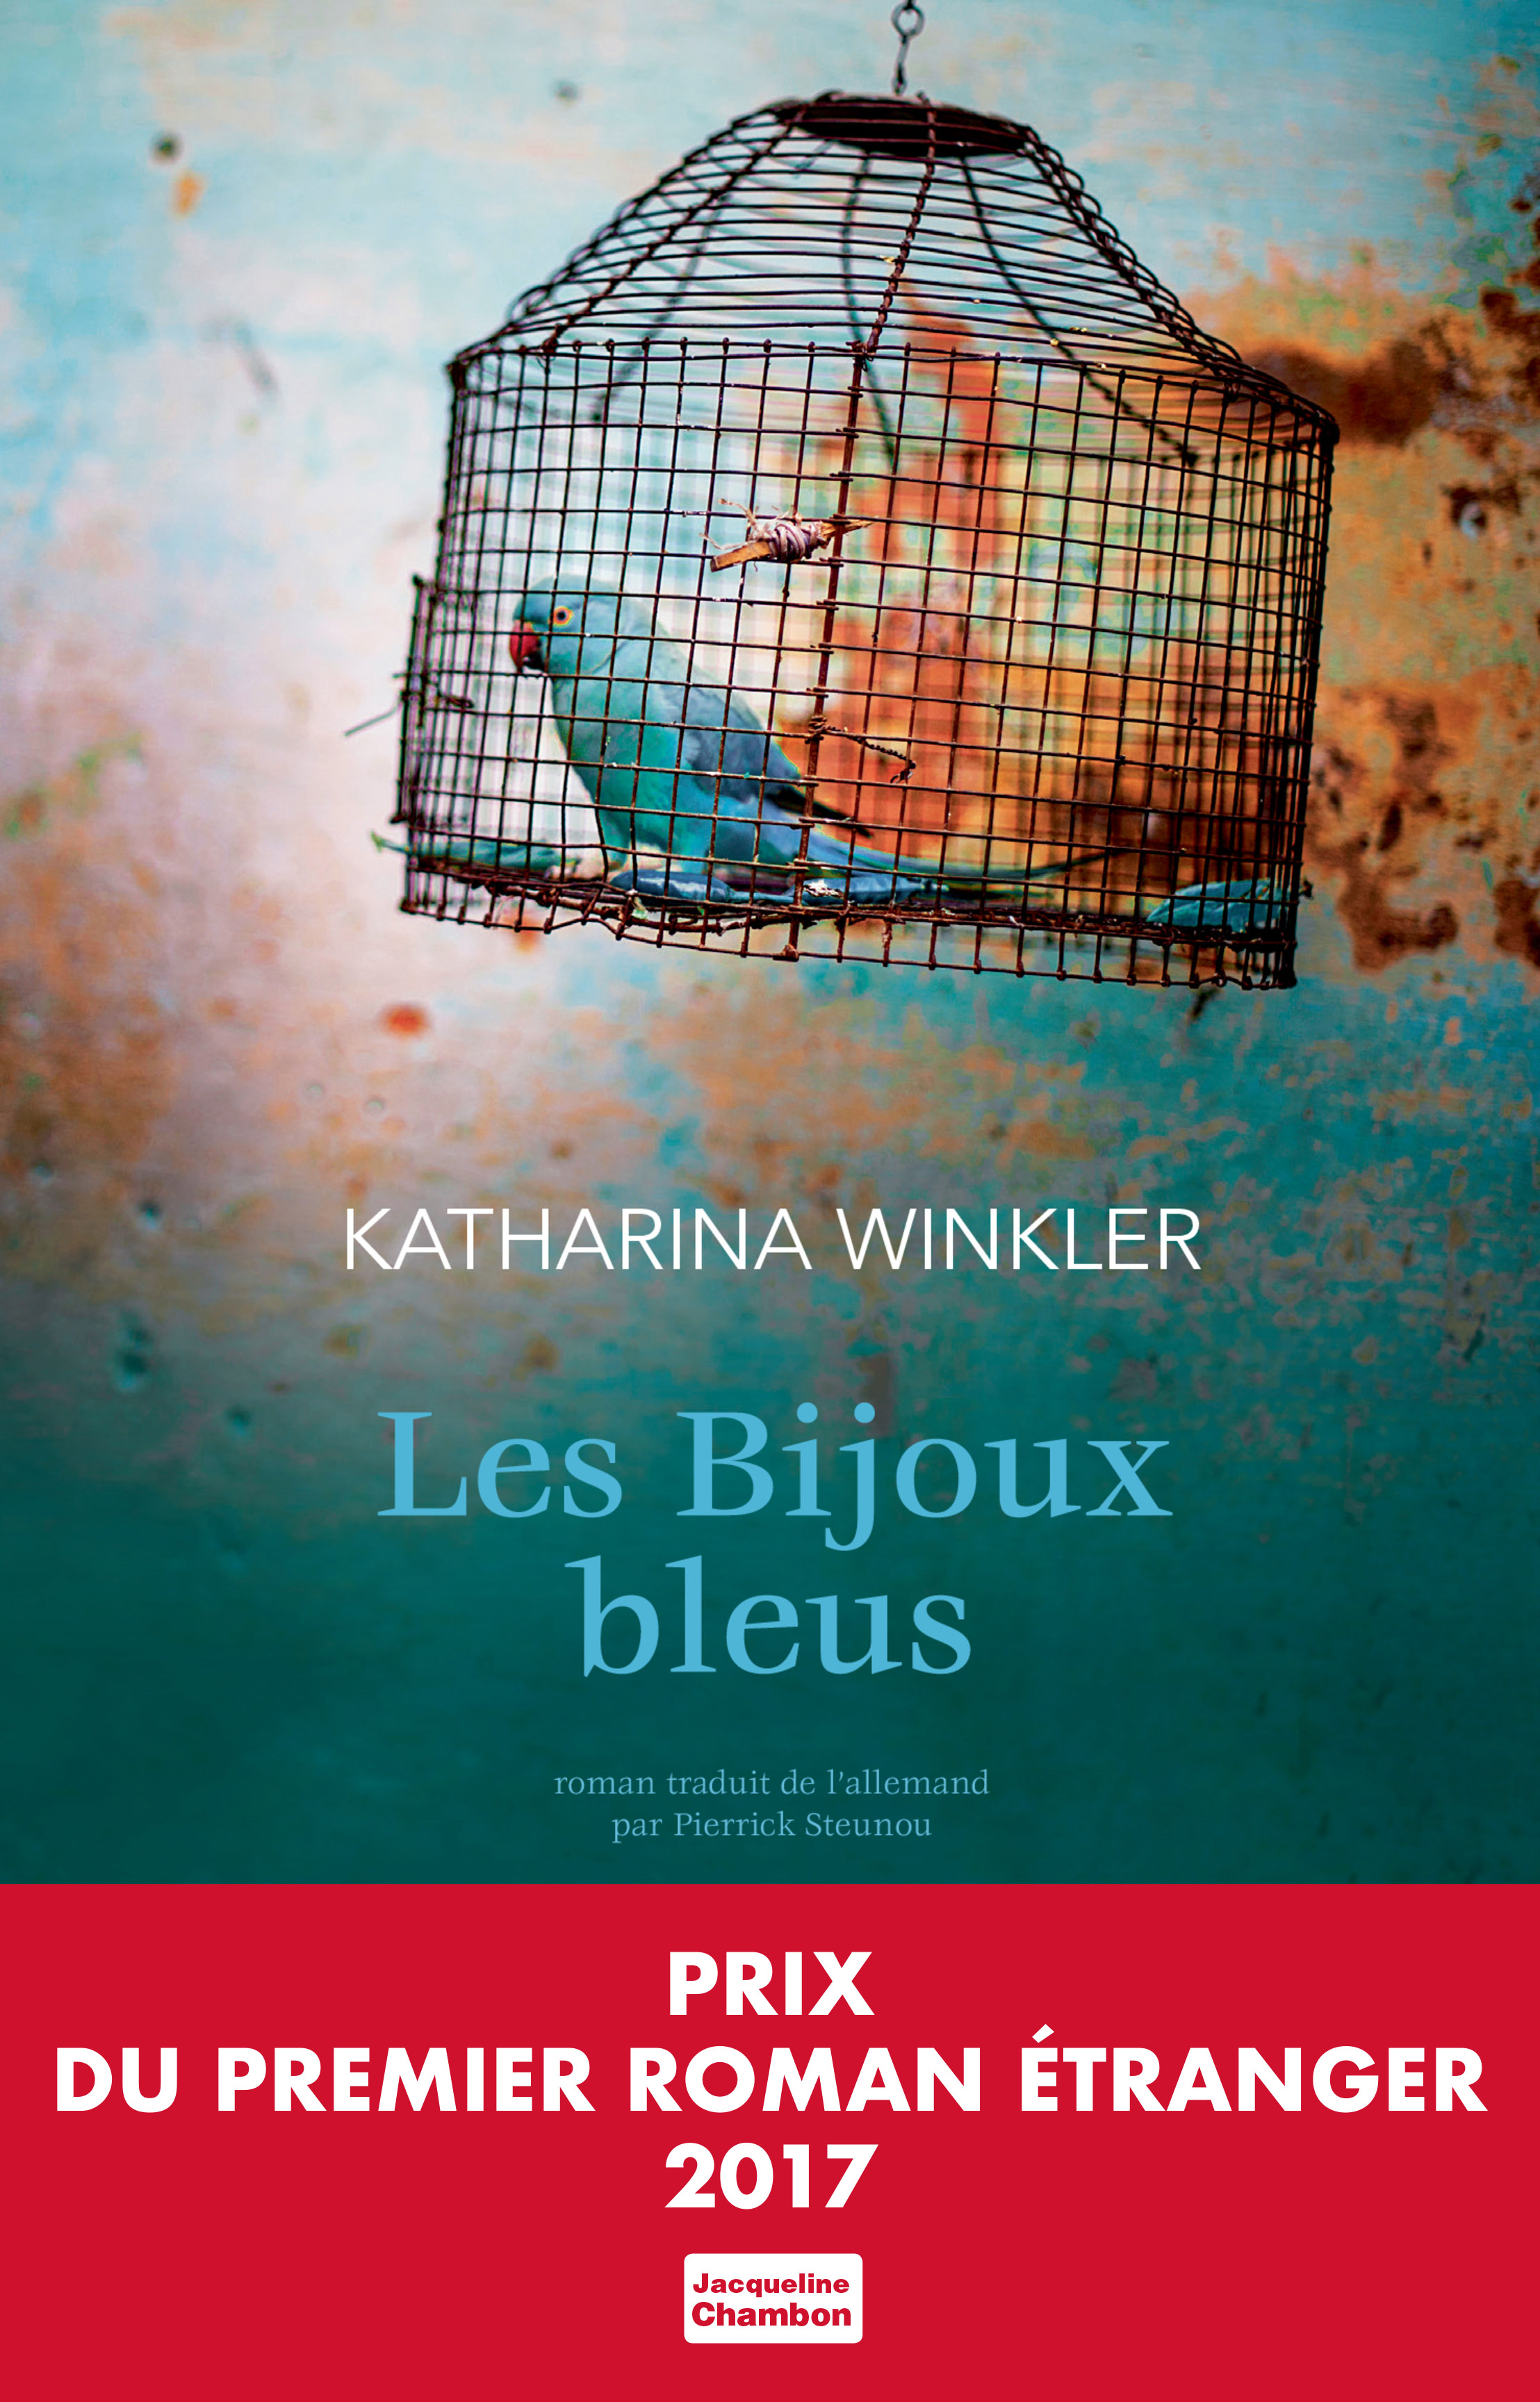 Les bijoux bleus | Winkler, Katharina